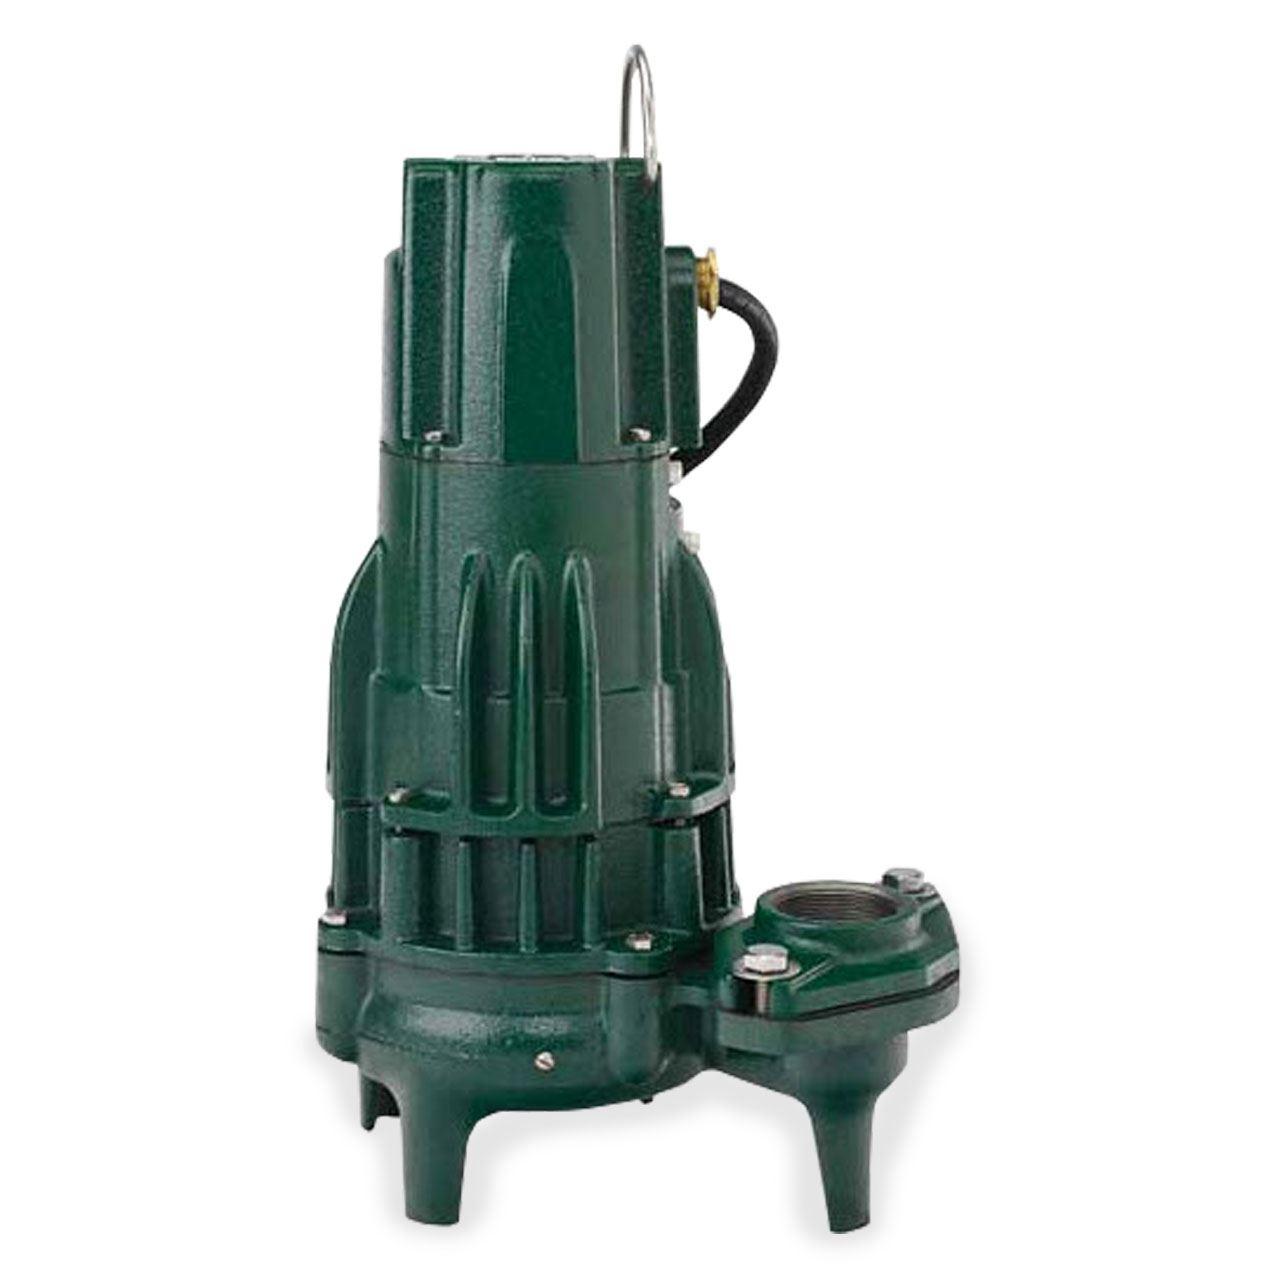 zoeller zoeller 295 0004 model e295 high head sewage dewatering Sewage Pump Basin Installation prev next